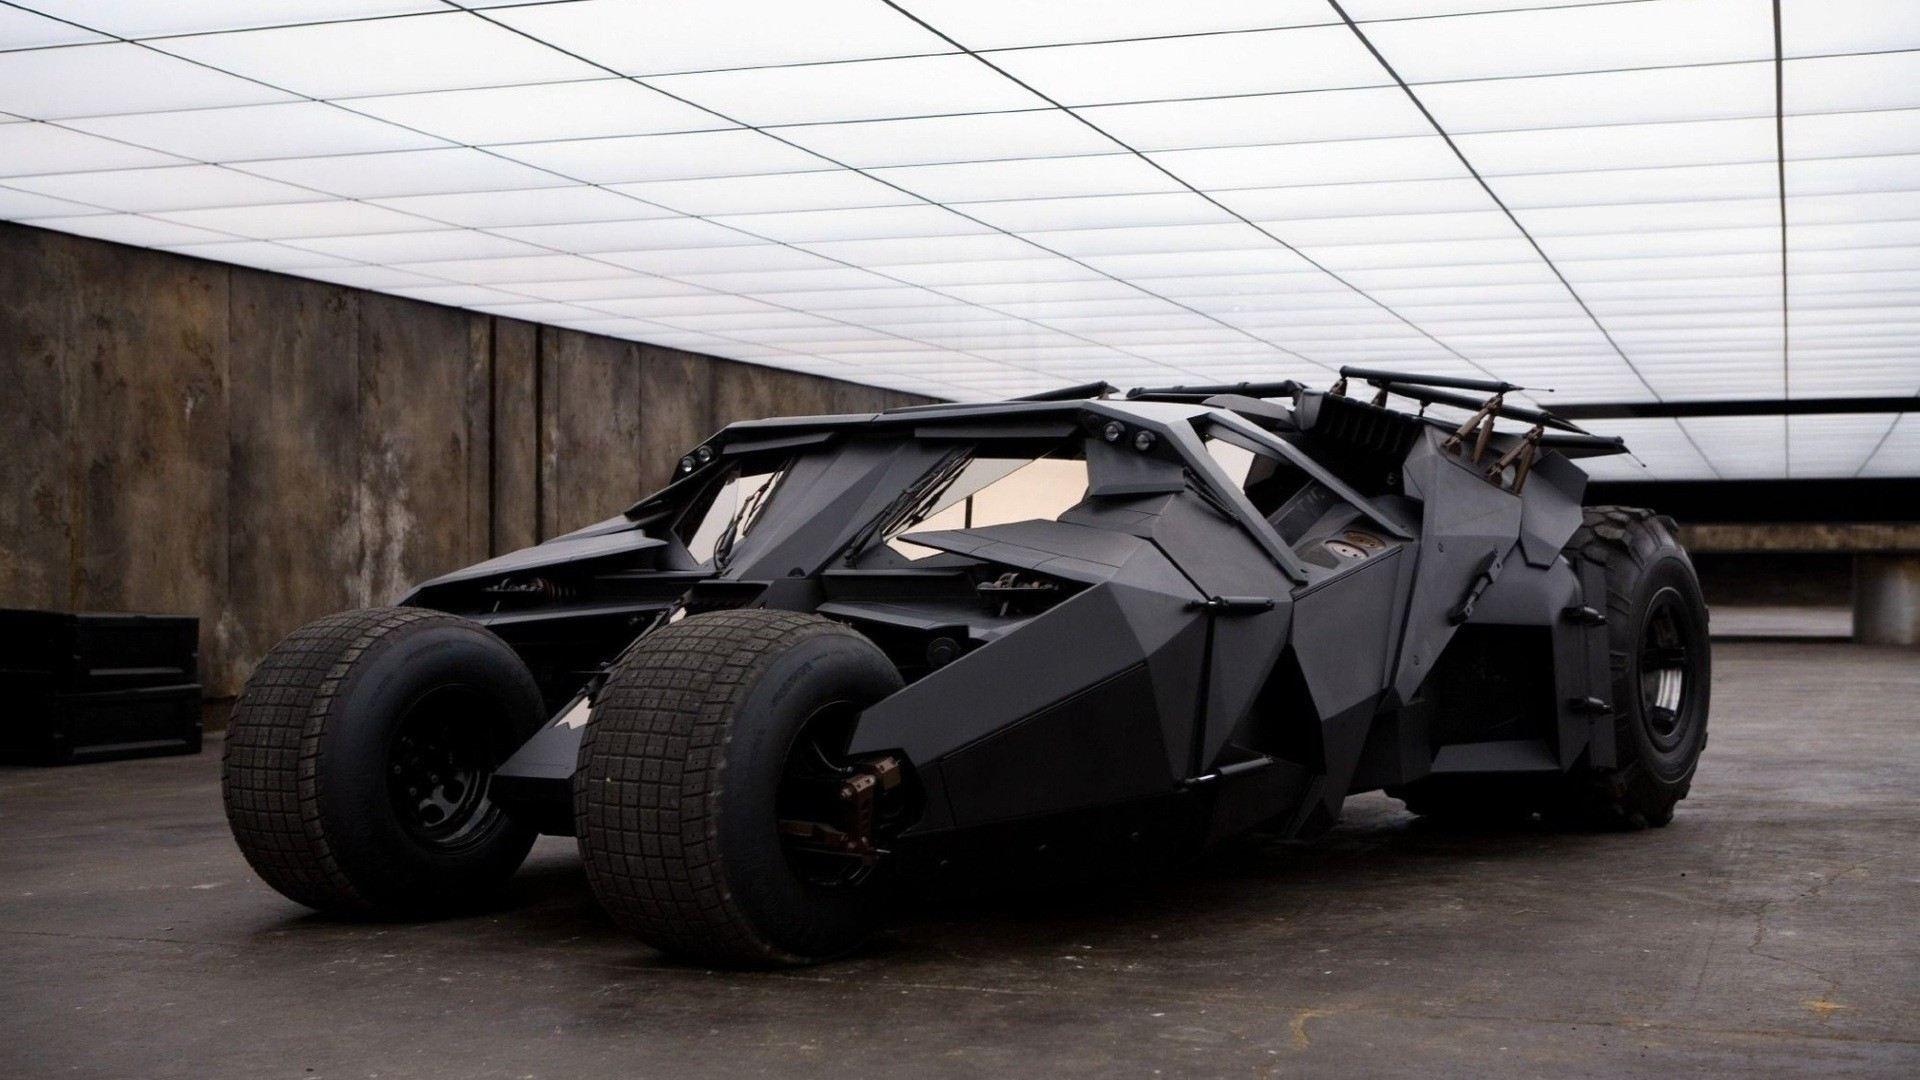 batman-batmobile-car-Favim.com-483238